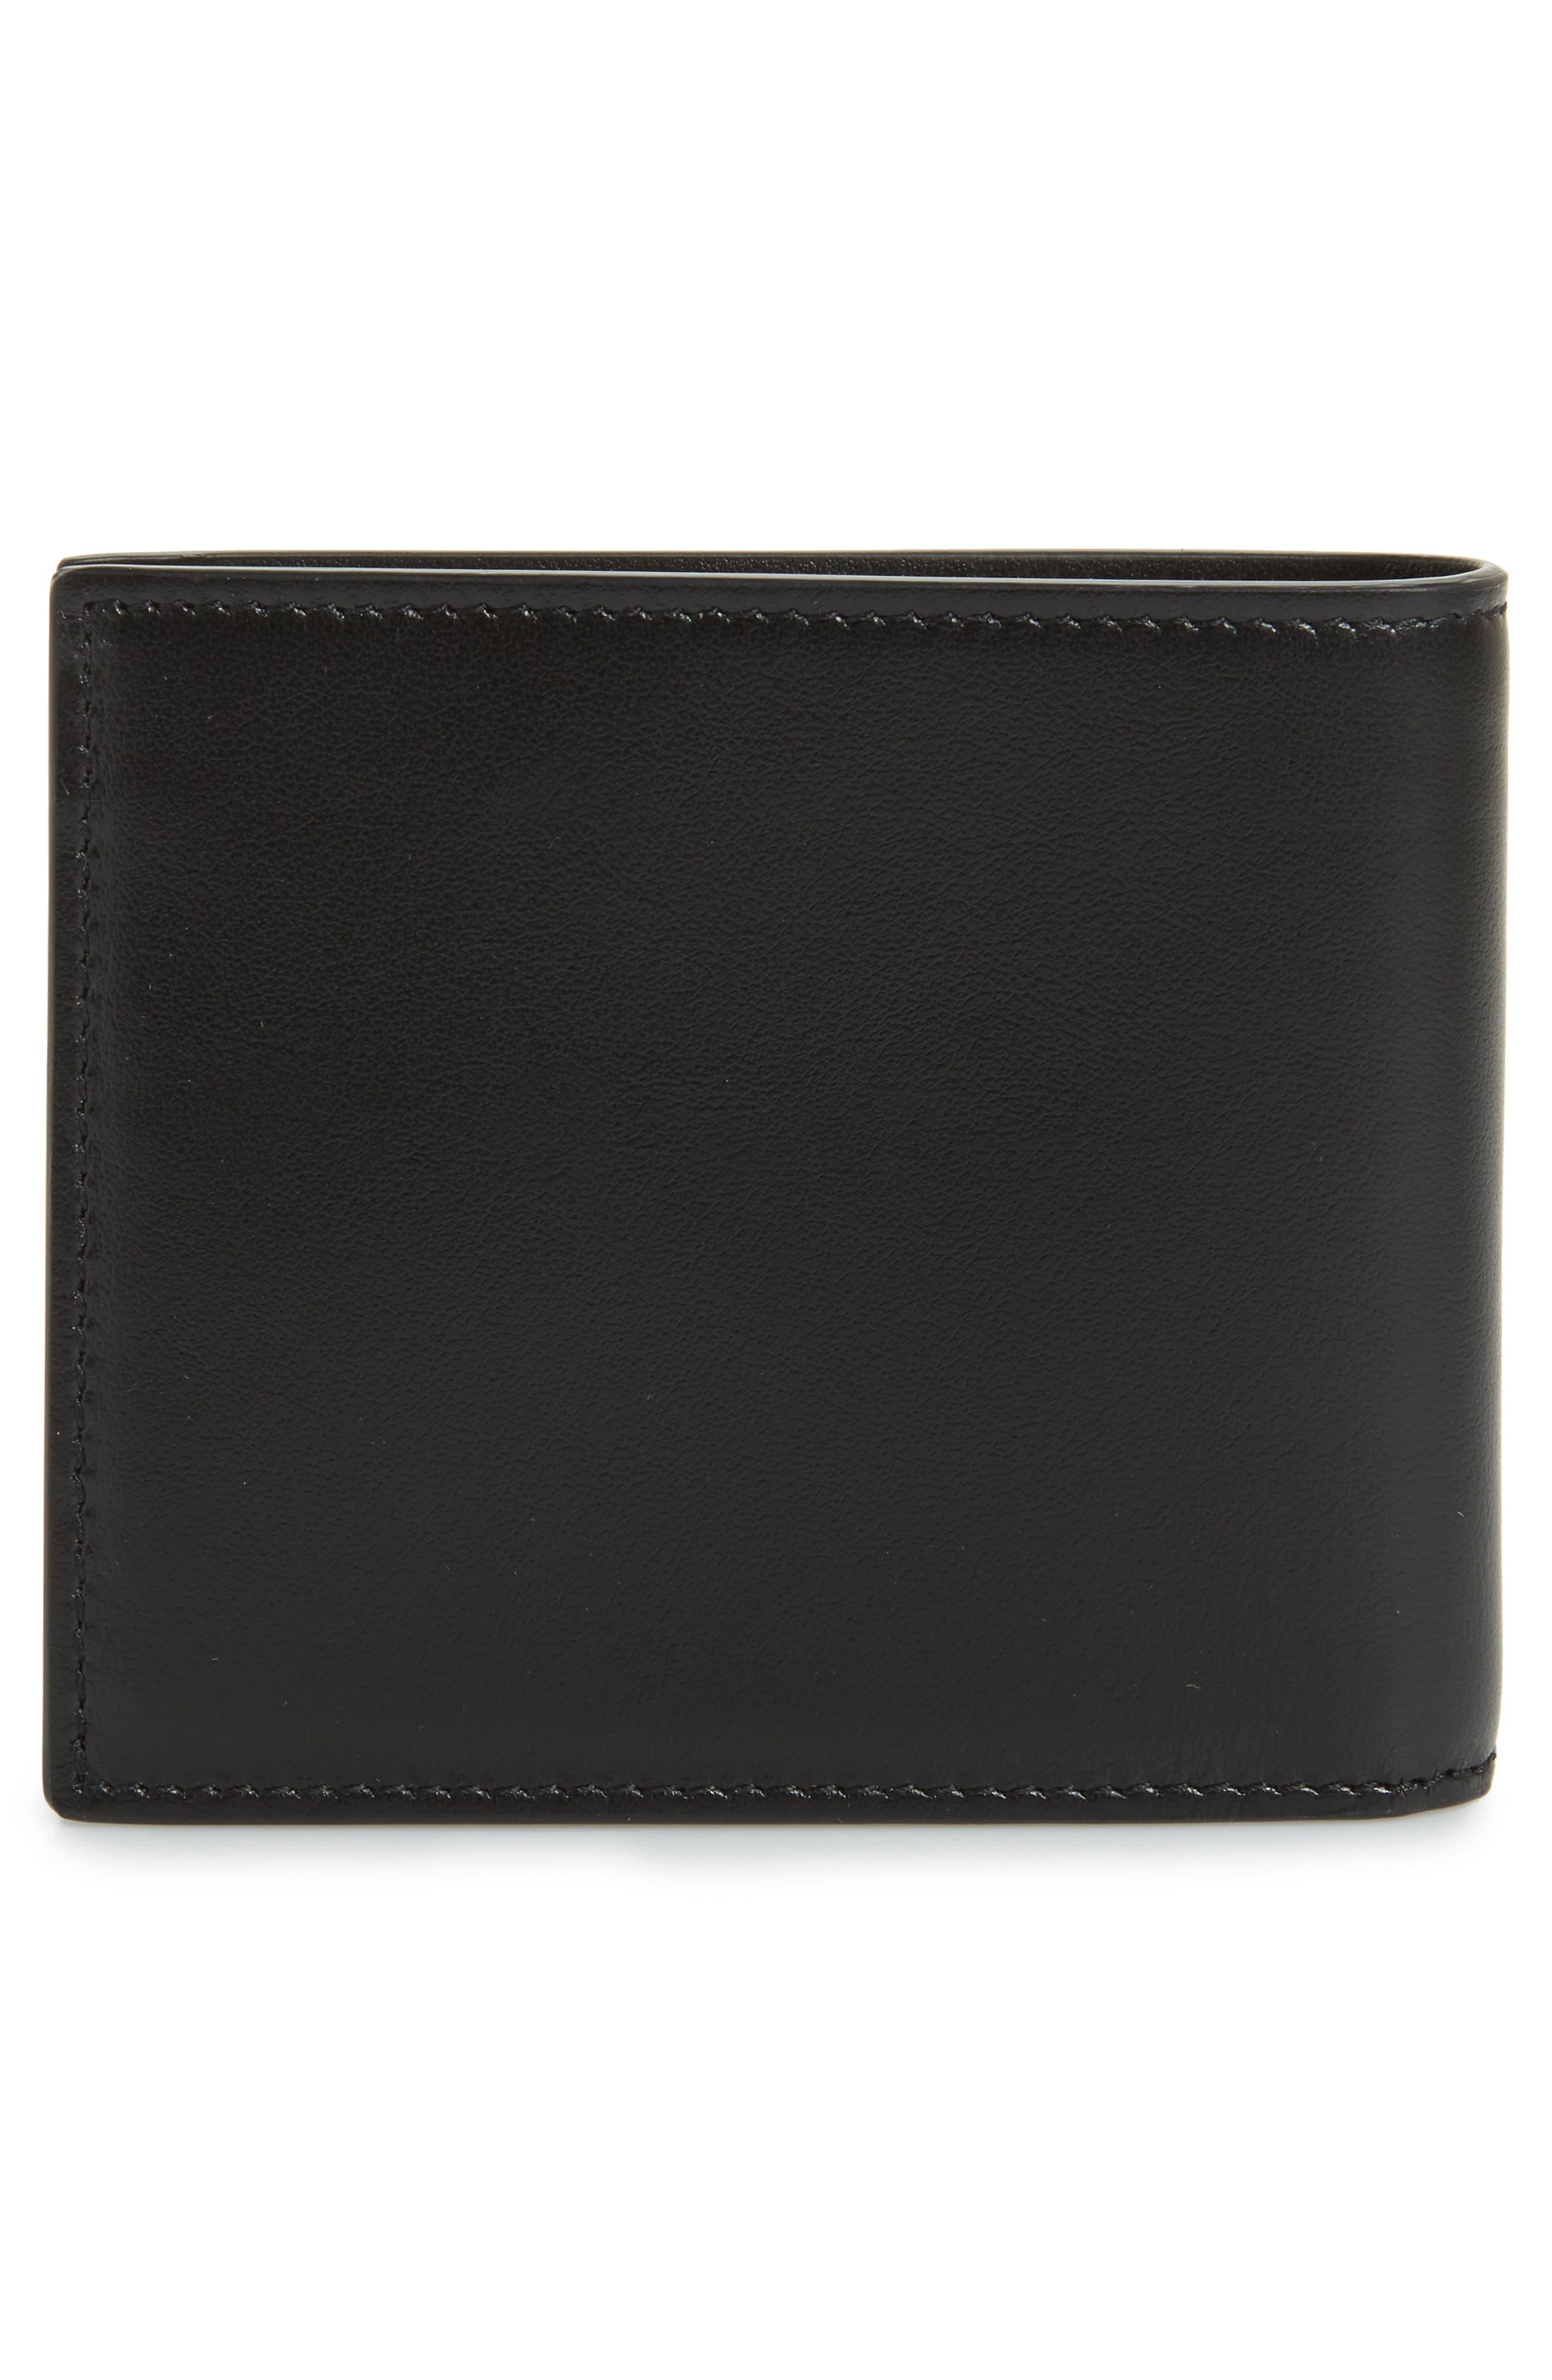 East/West Leather Wallet,                             Alternate thumbnail 3, color,                             Black